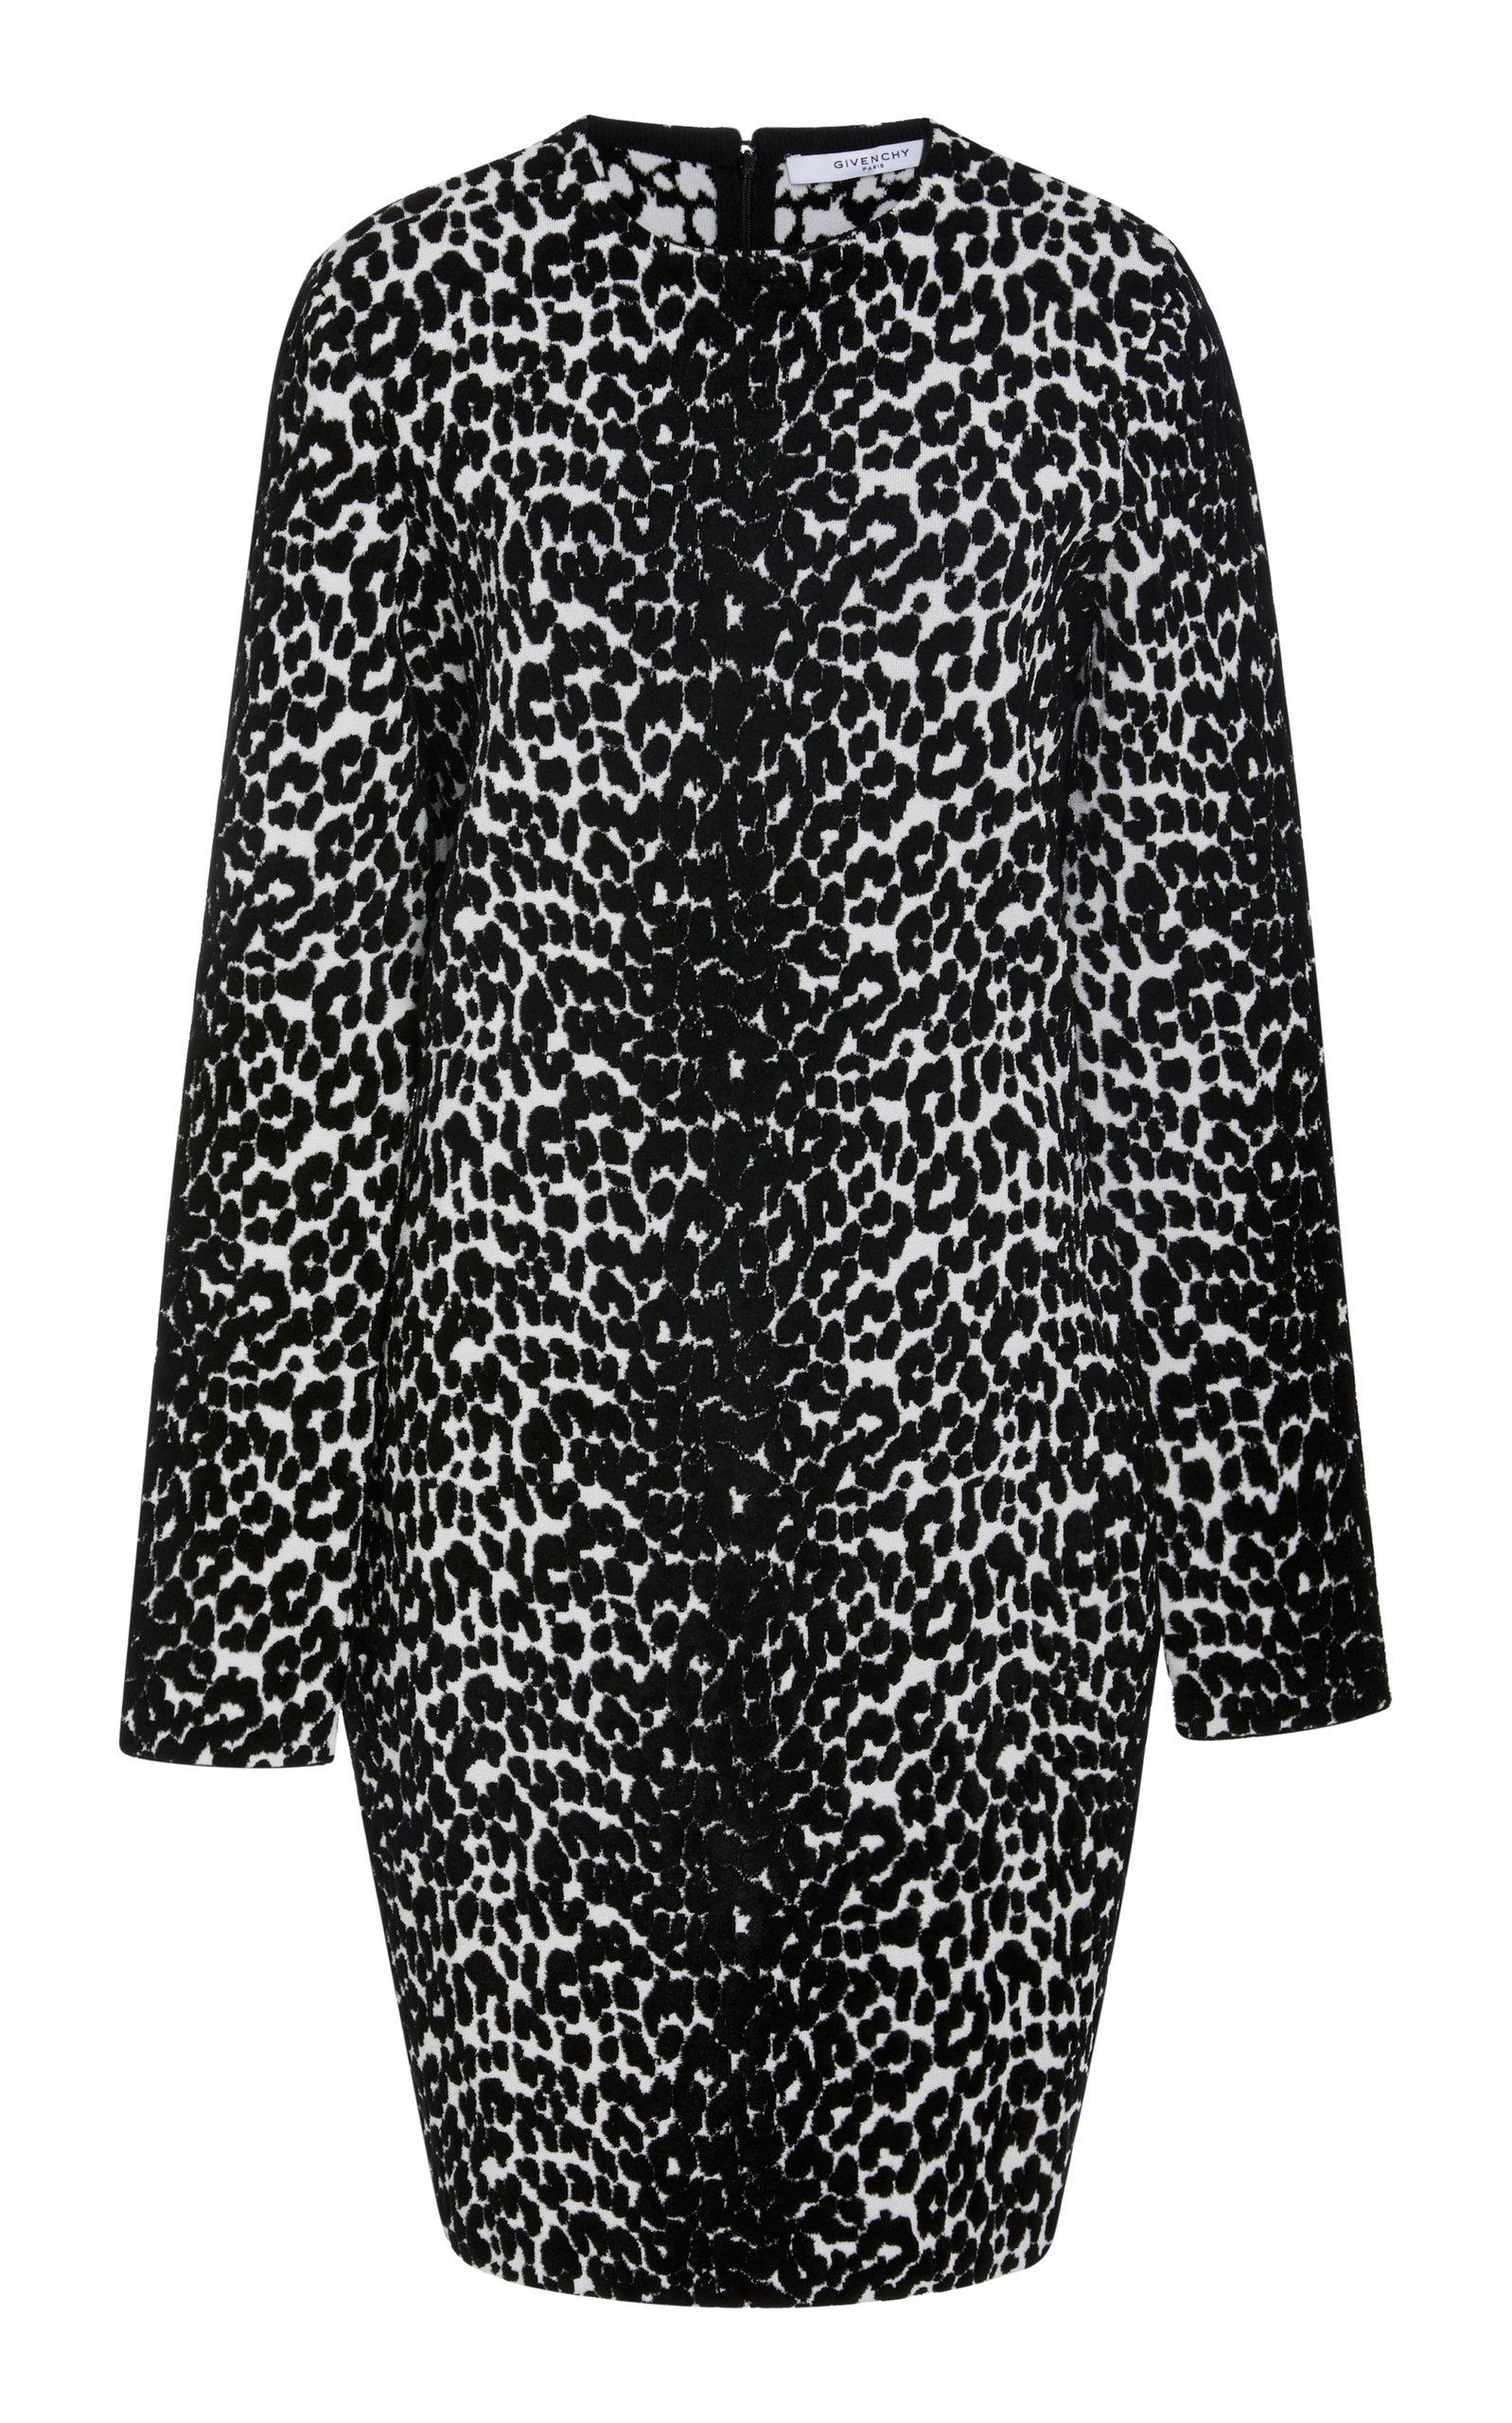 7daefbcbb5 Givenchy - Black Leopard-print Stretch-knit Mini Dress - Lyst. View  fullscreen